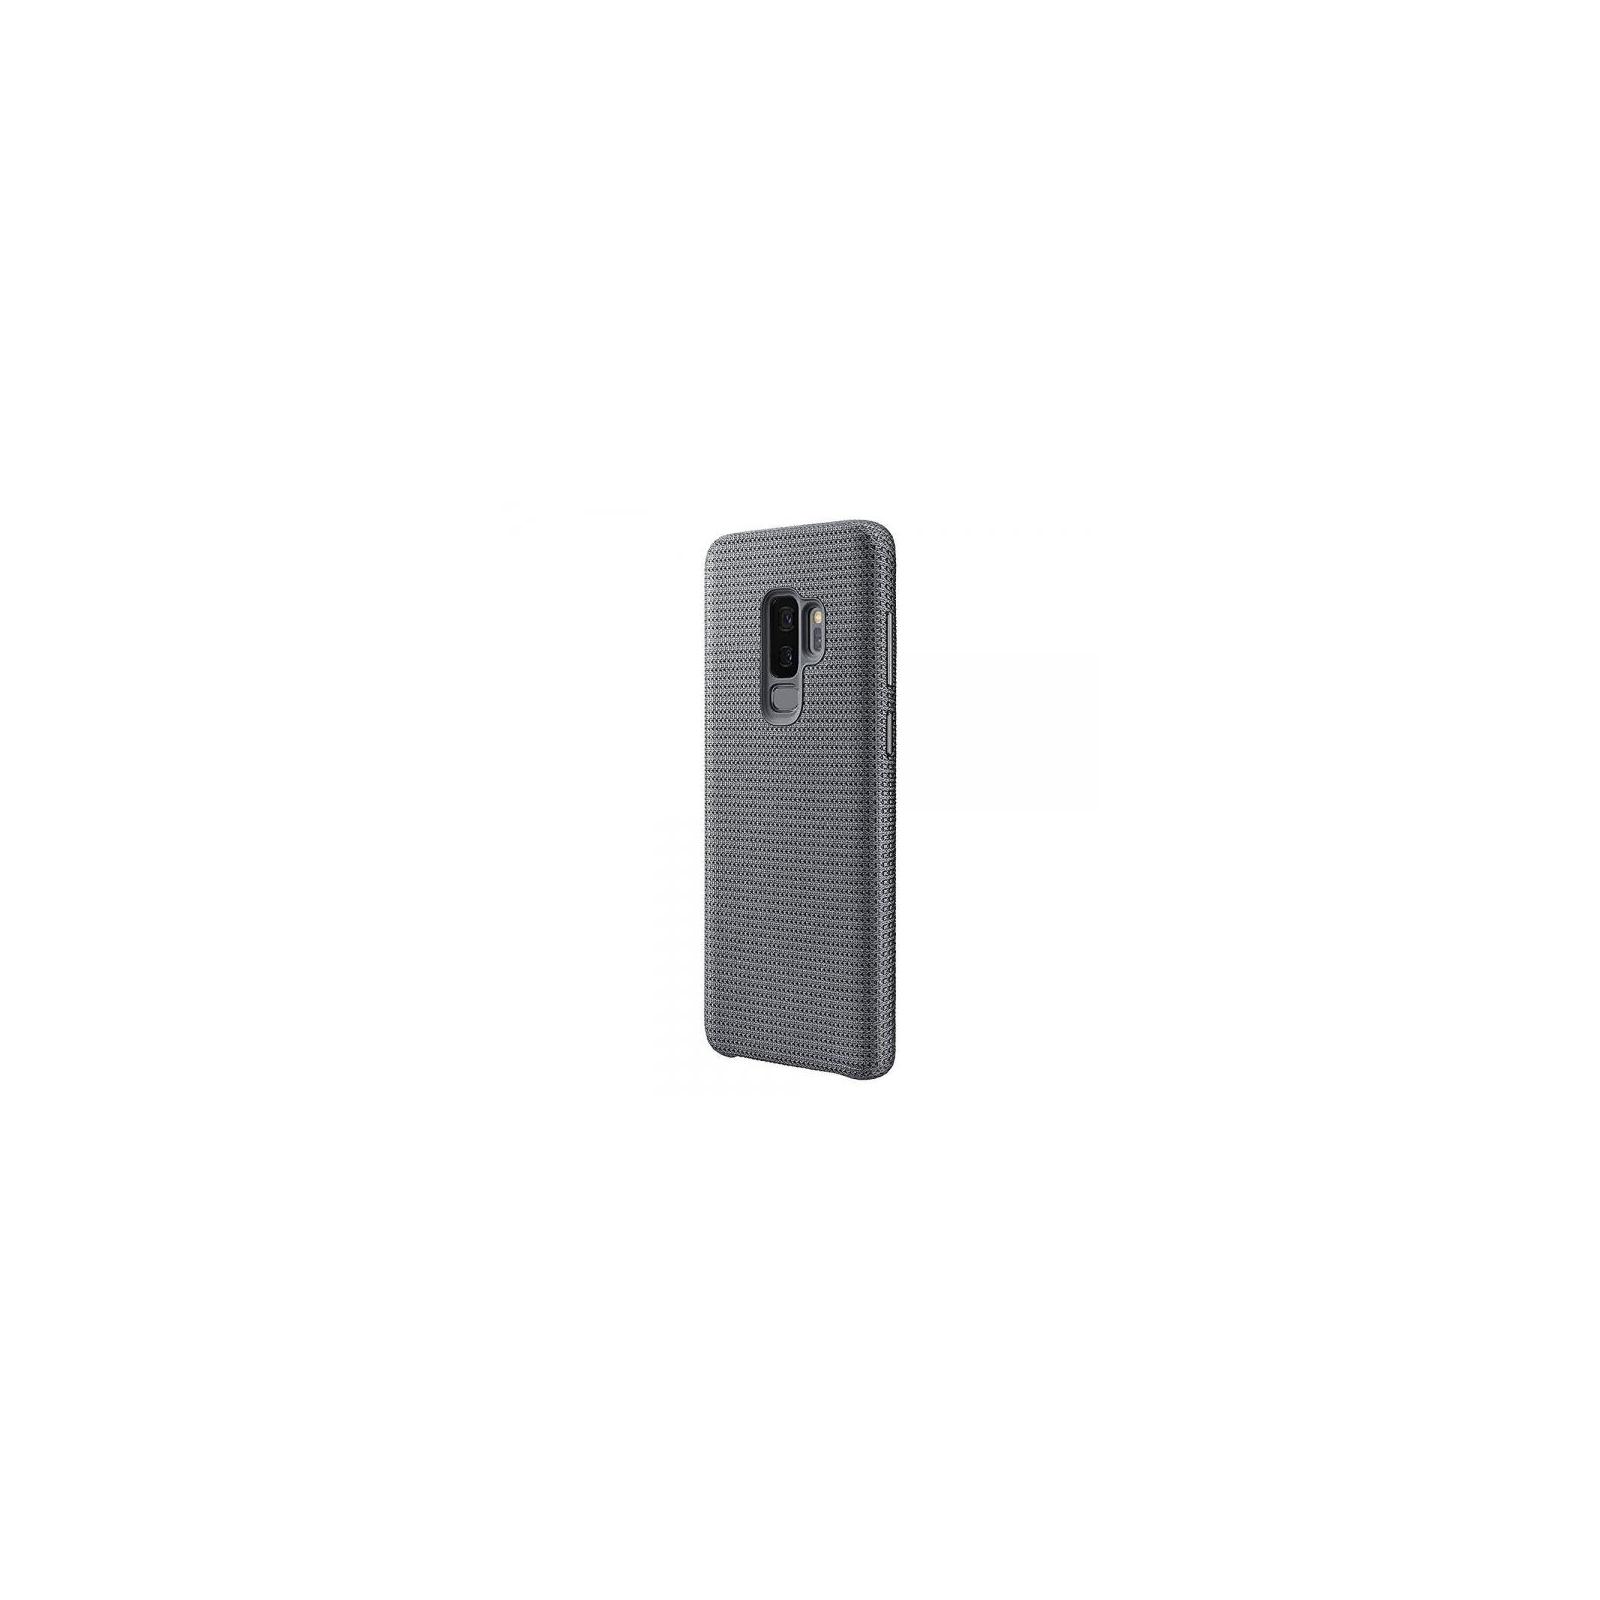 Чехол для моб. телефона Samsung для Galaxy S9+ (G965) Hyperknit Cover Grey (EF-GG965FJEGRU) изображение 4